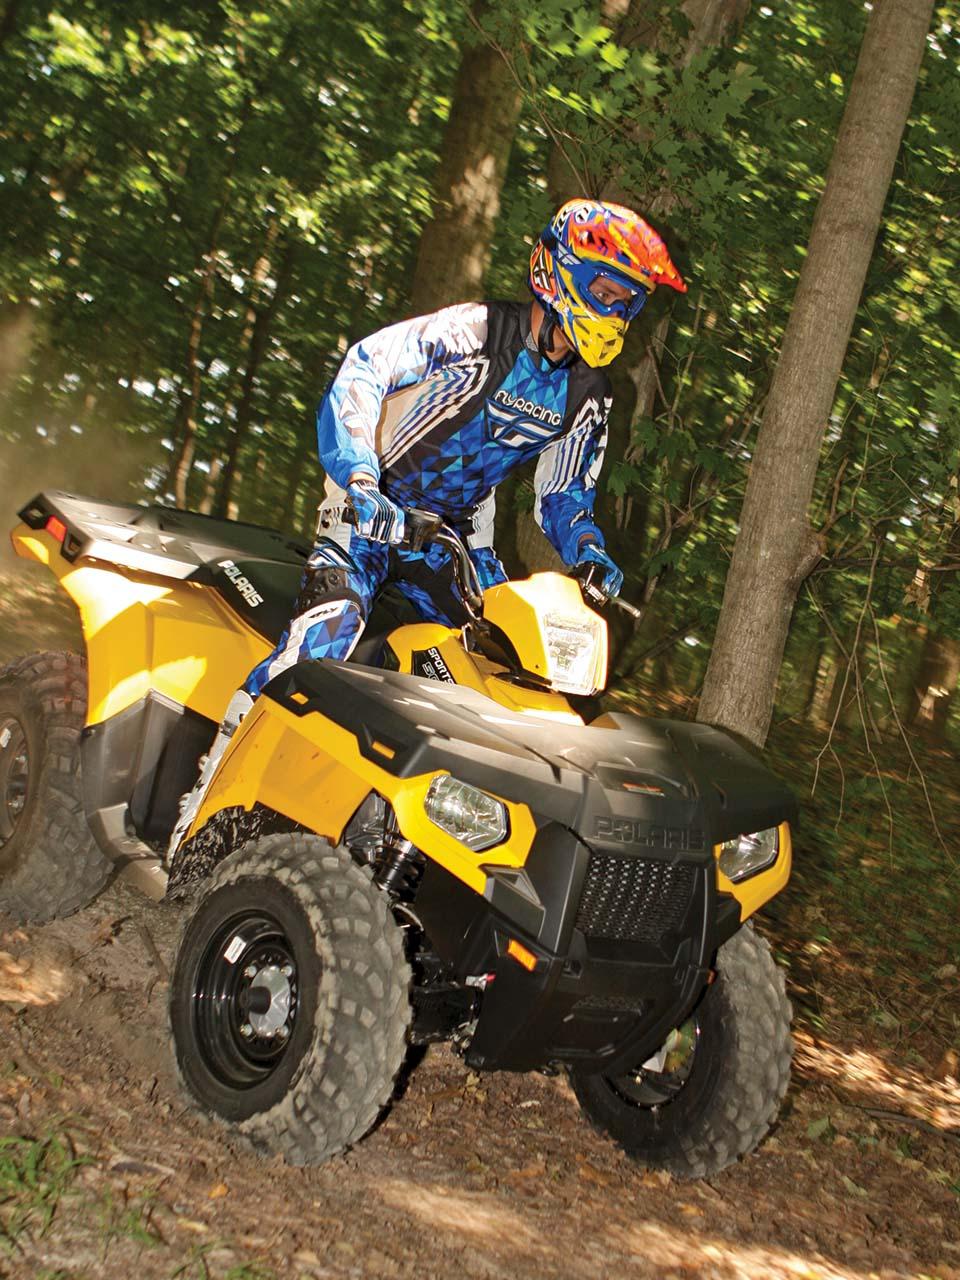 medium resolution of 2012 polaris sportsman500ho yellow front right riding through